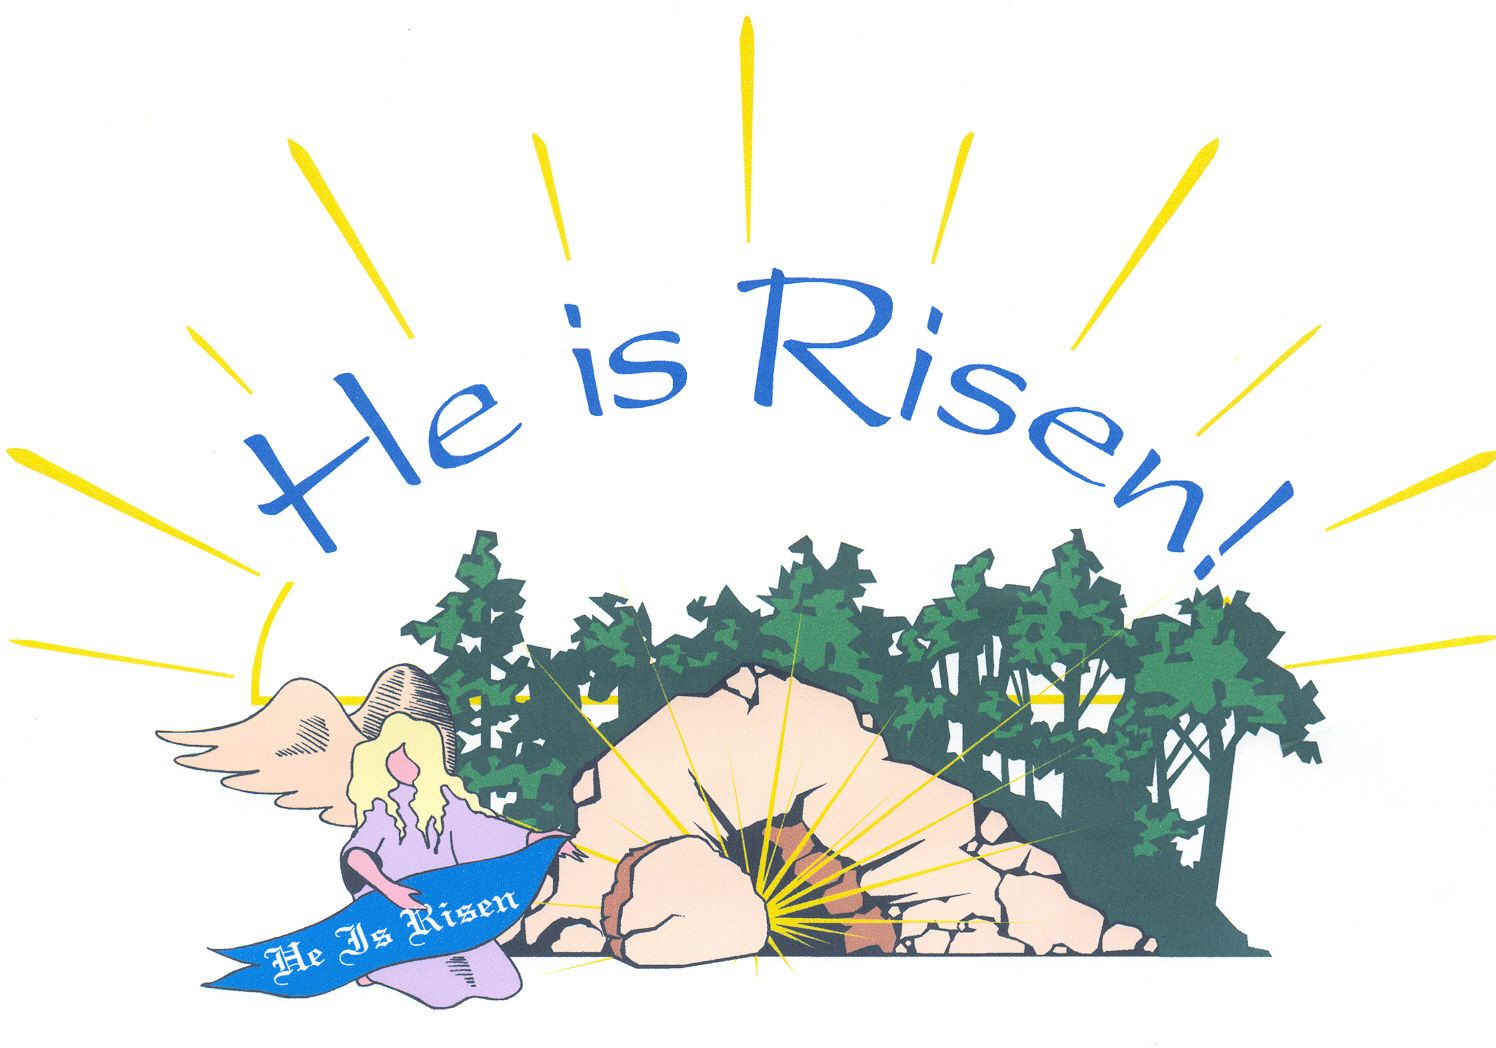 hight resolution of free christian clip art free christian wallpaper jesus is risen he is risen